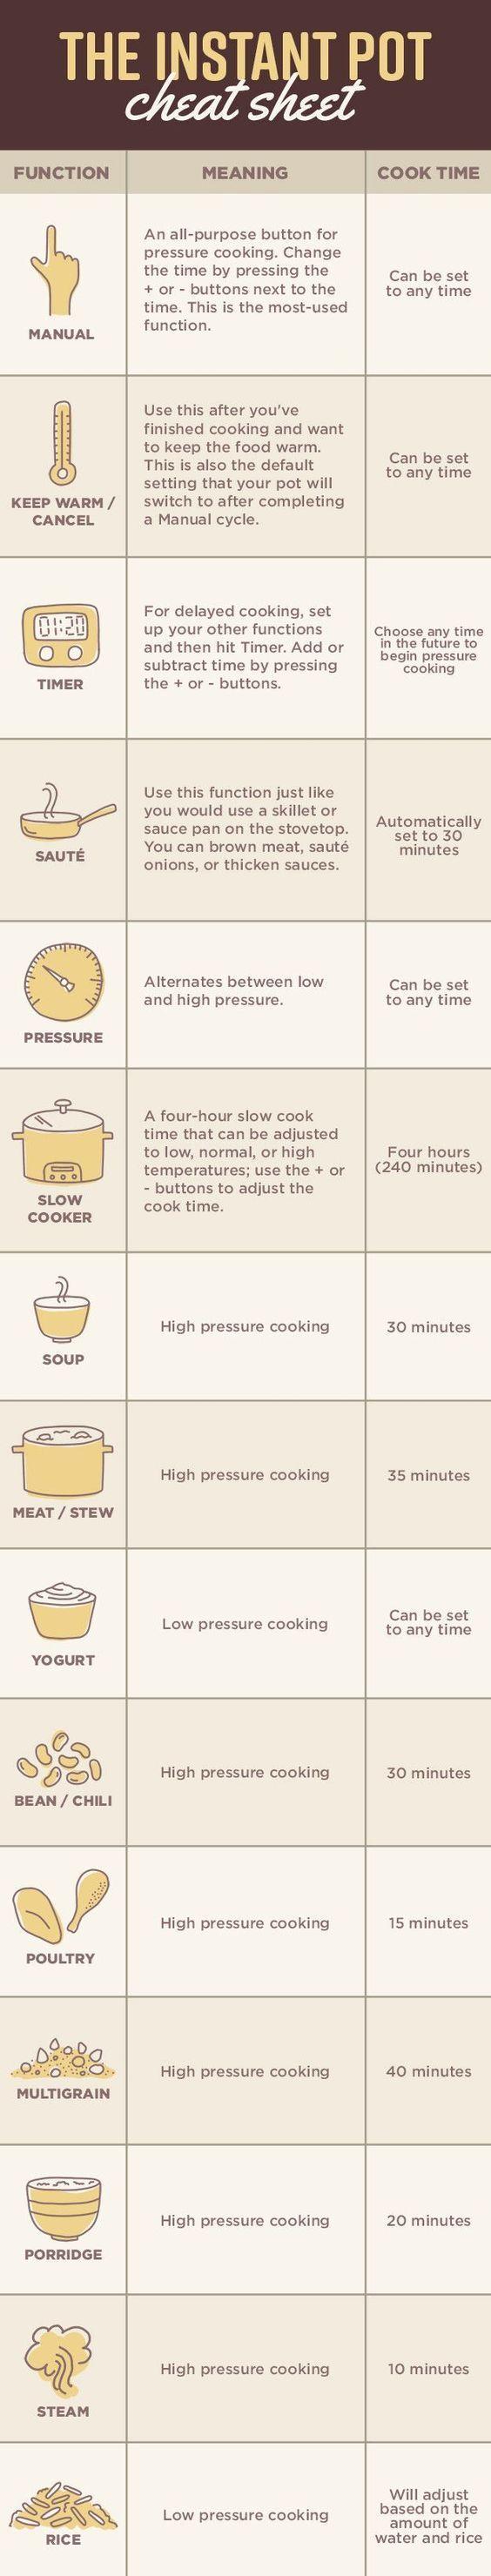 17 Instant Pot Tips For Beginners